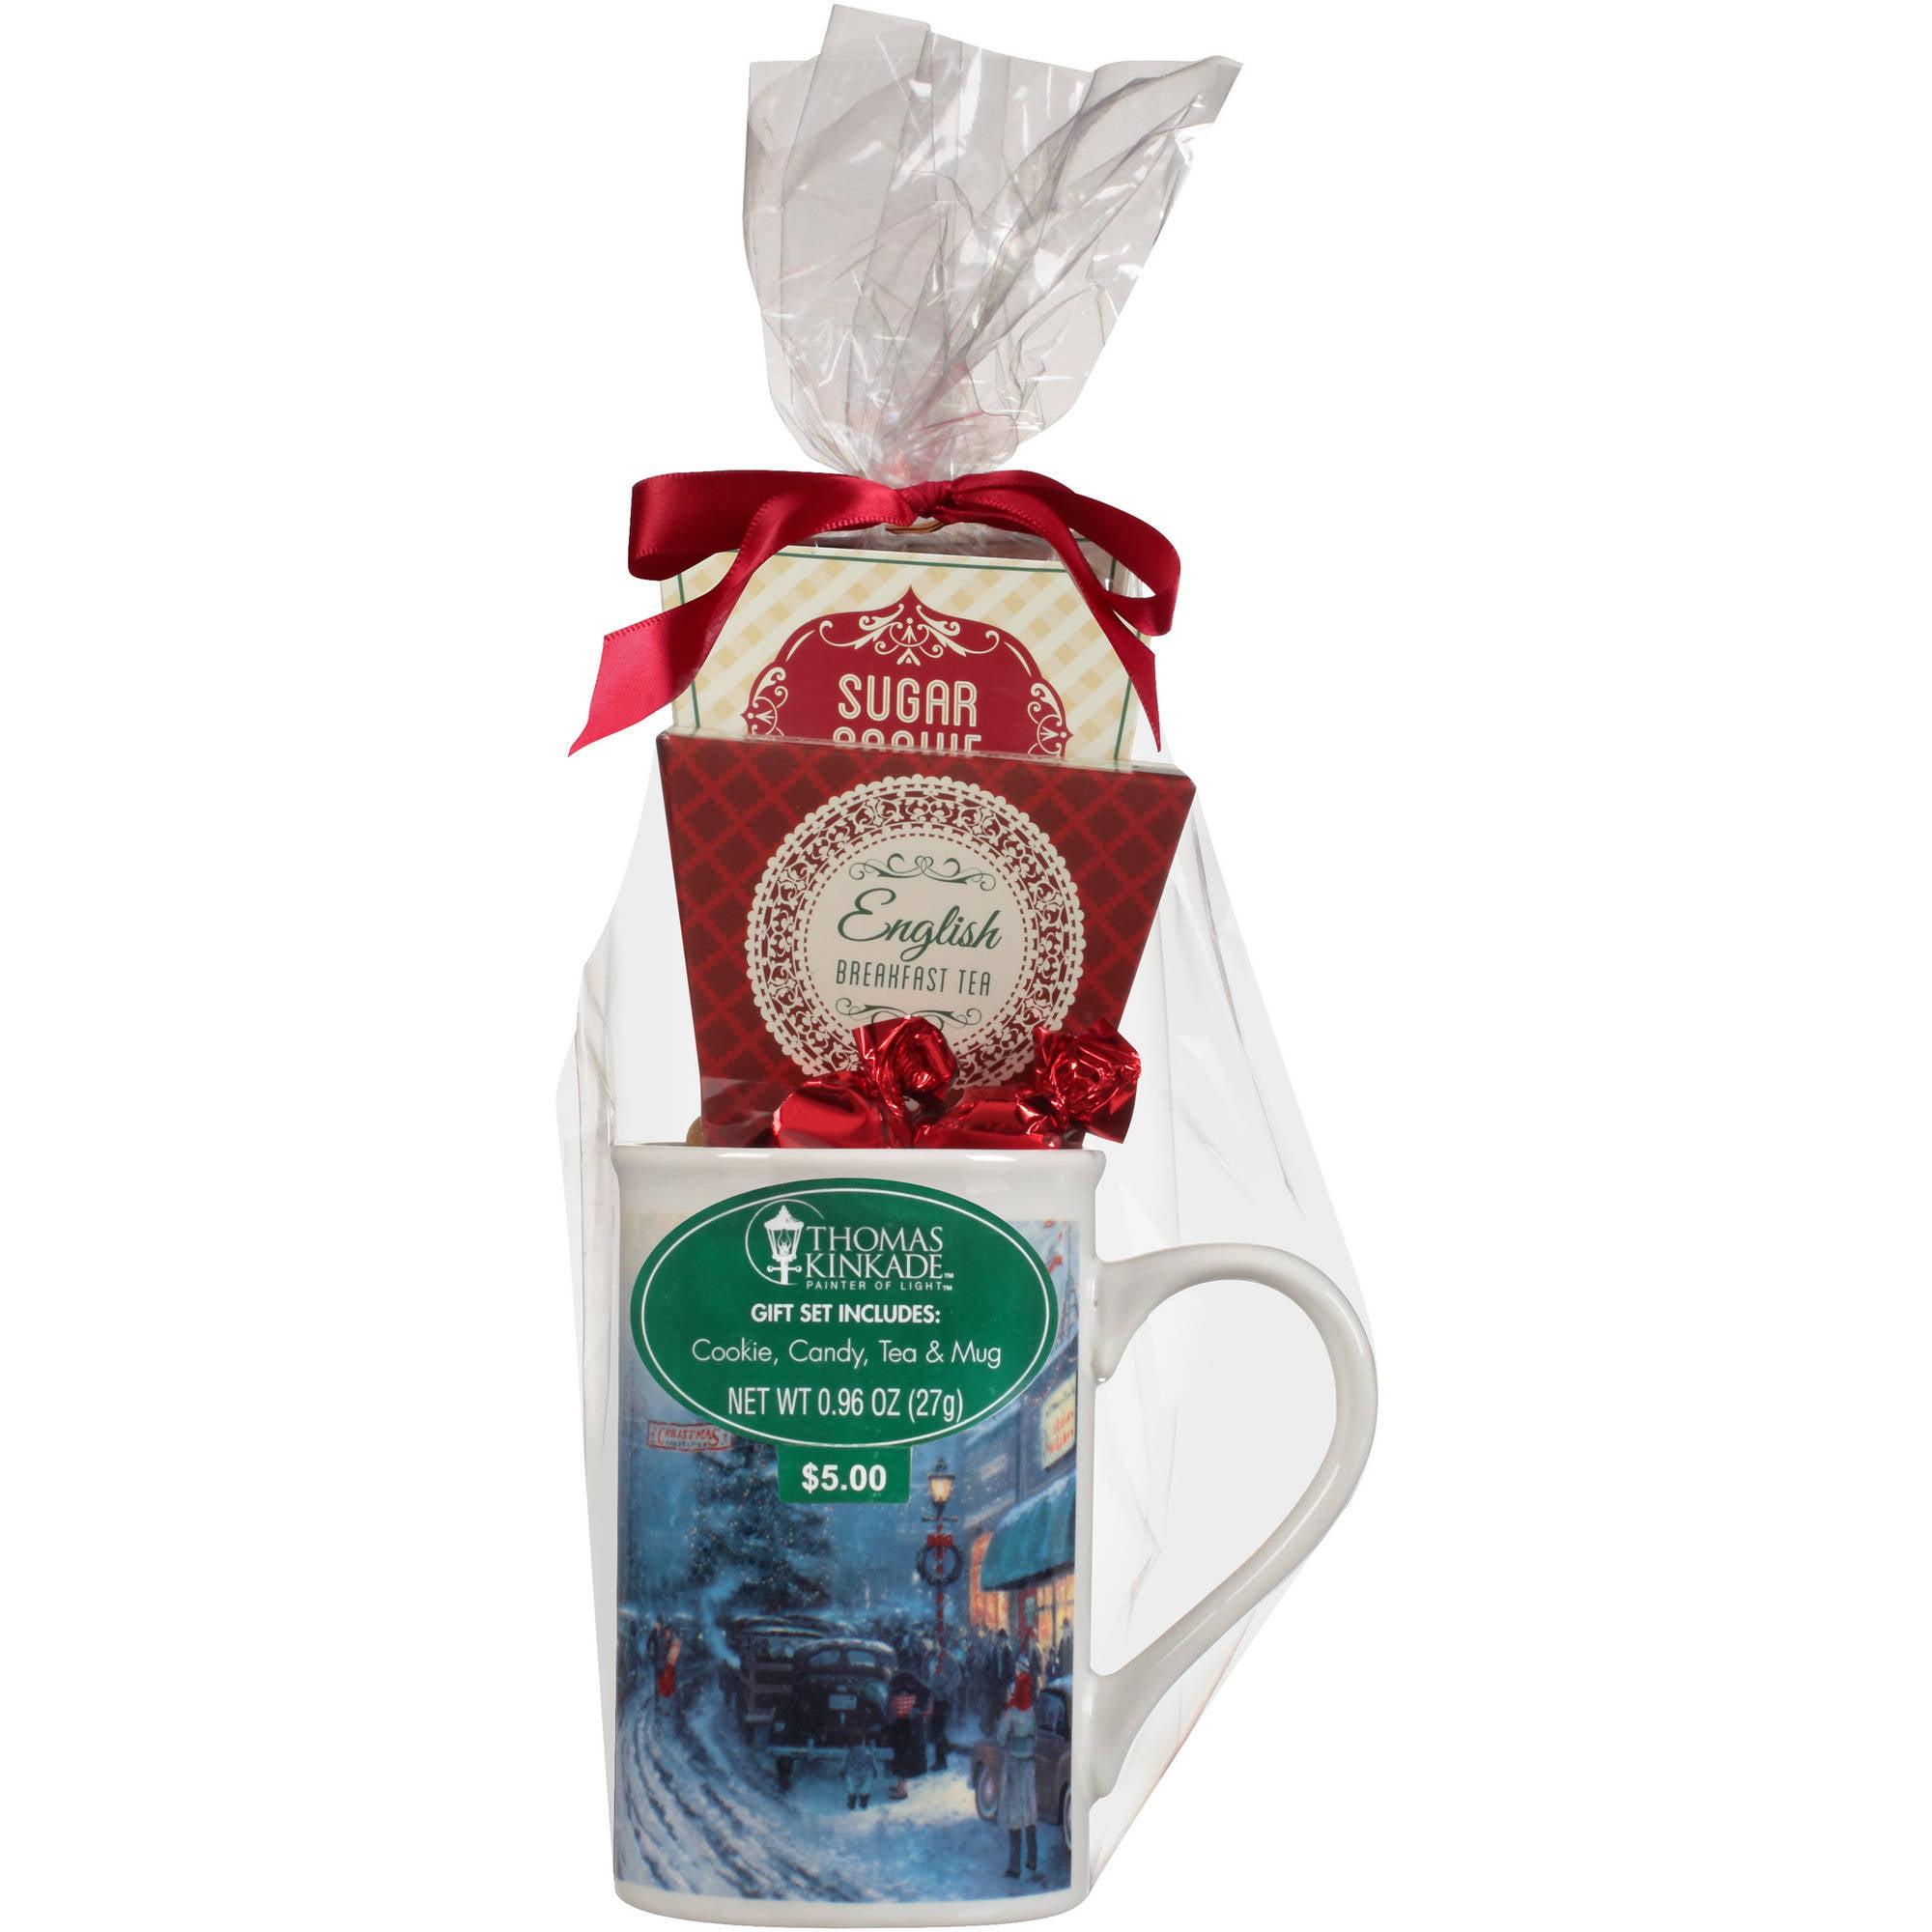 Nestle nesquik tumbler holiday gift set includes